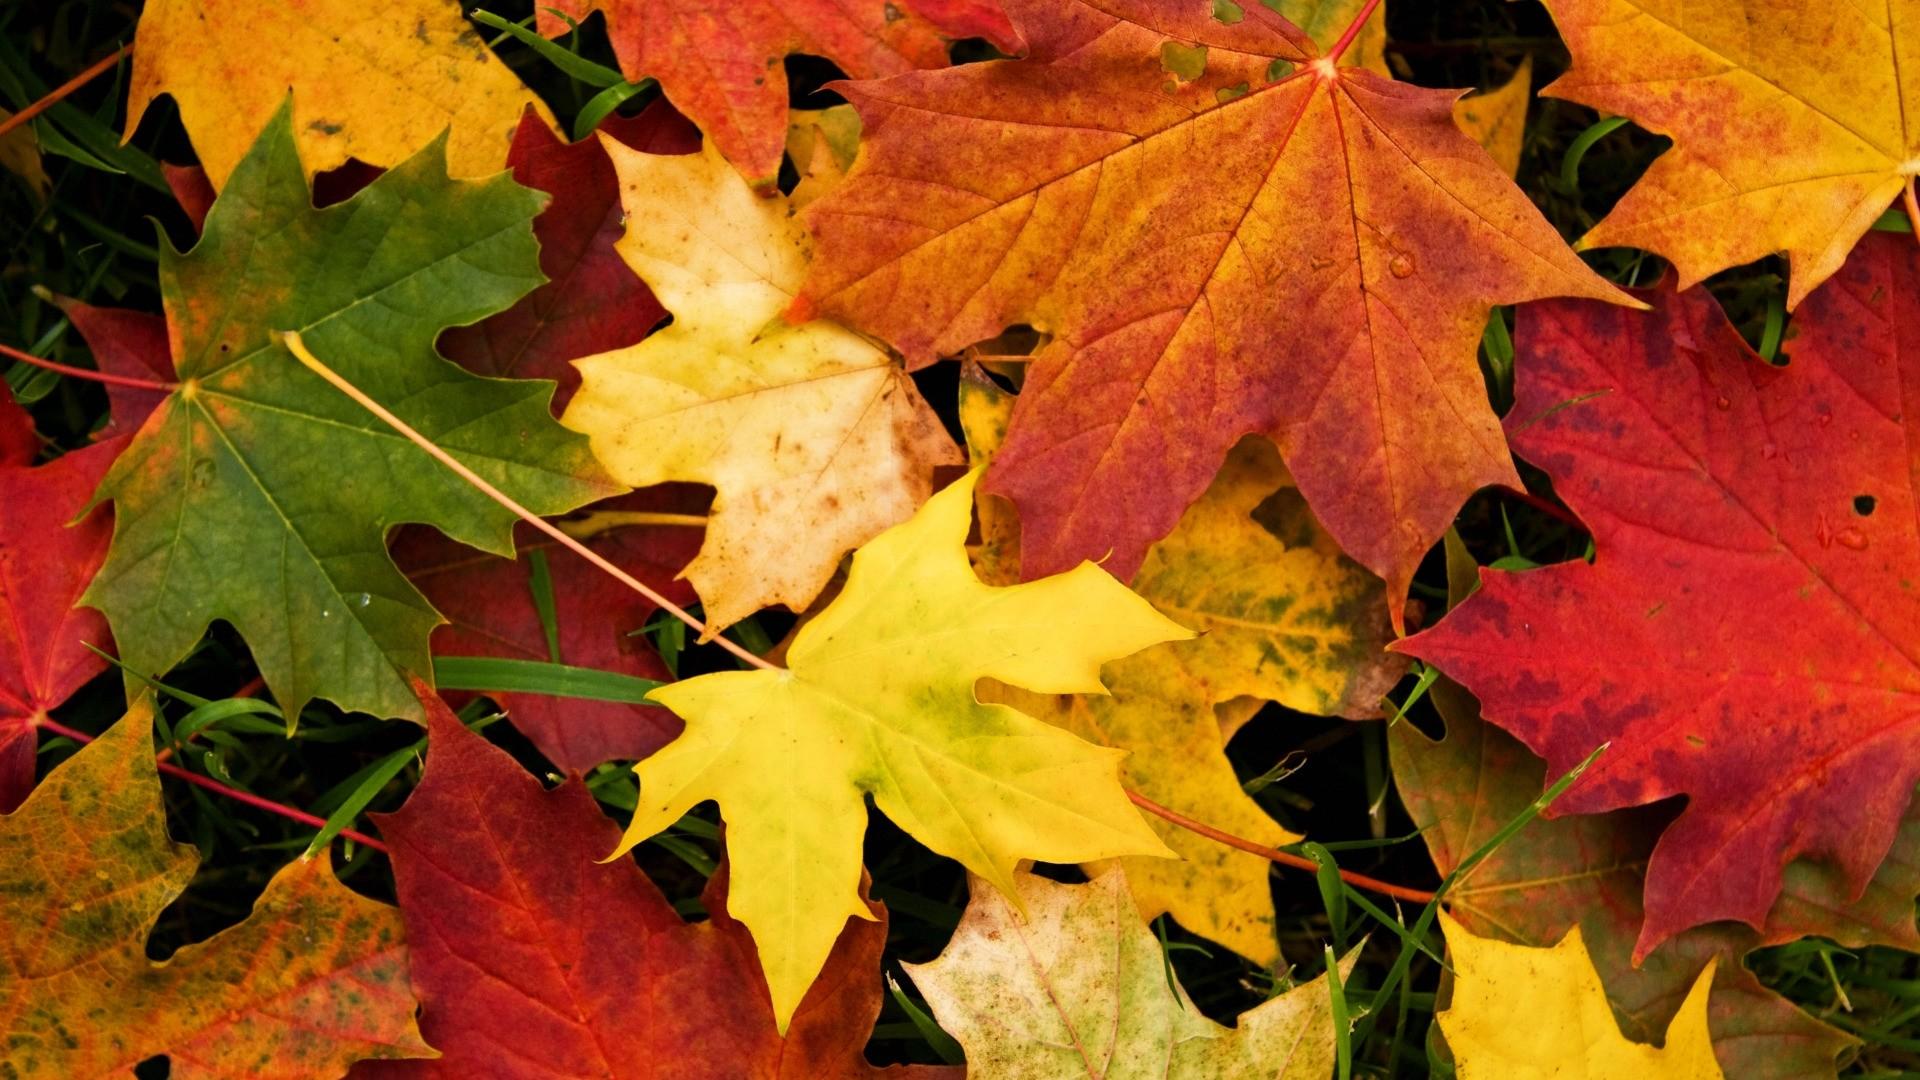 Fall Leaves hd wallpaper download